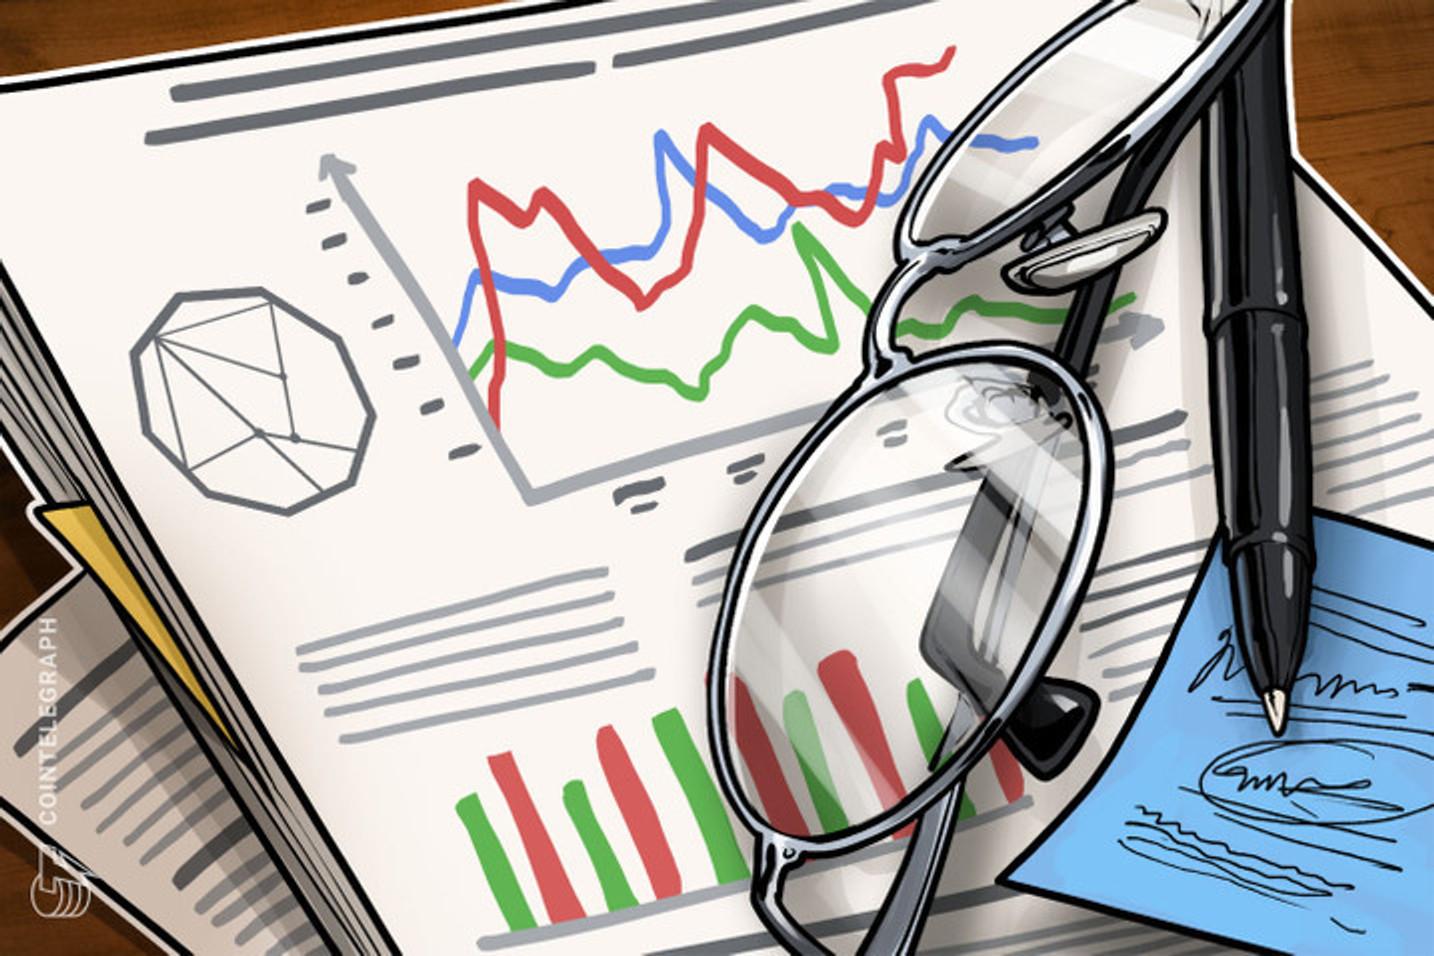 Exchange mexicano lanza concurso de Paper Trading para nuevos usuarios en Latinoamérica